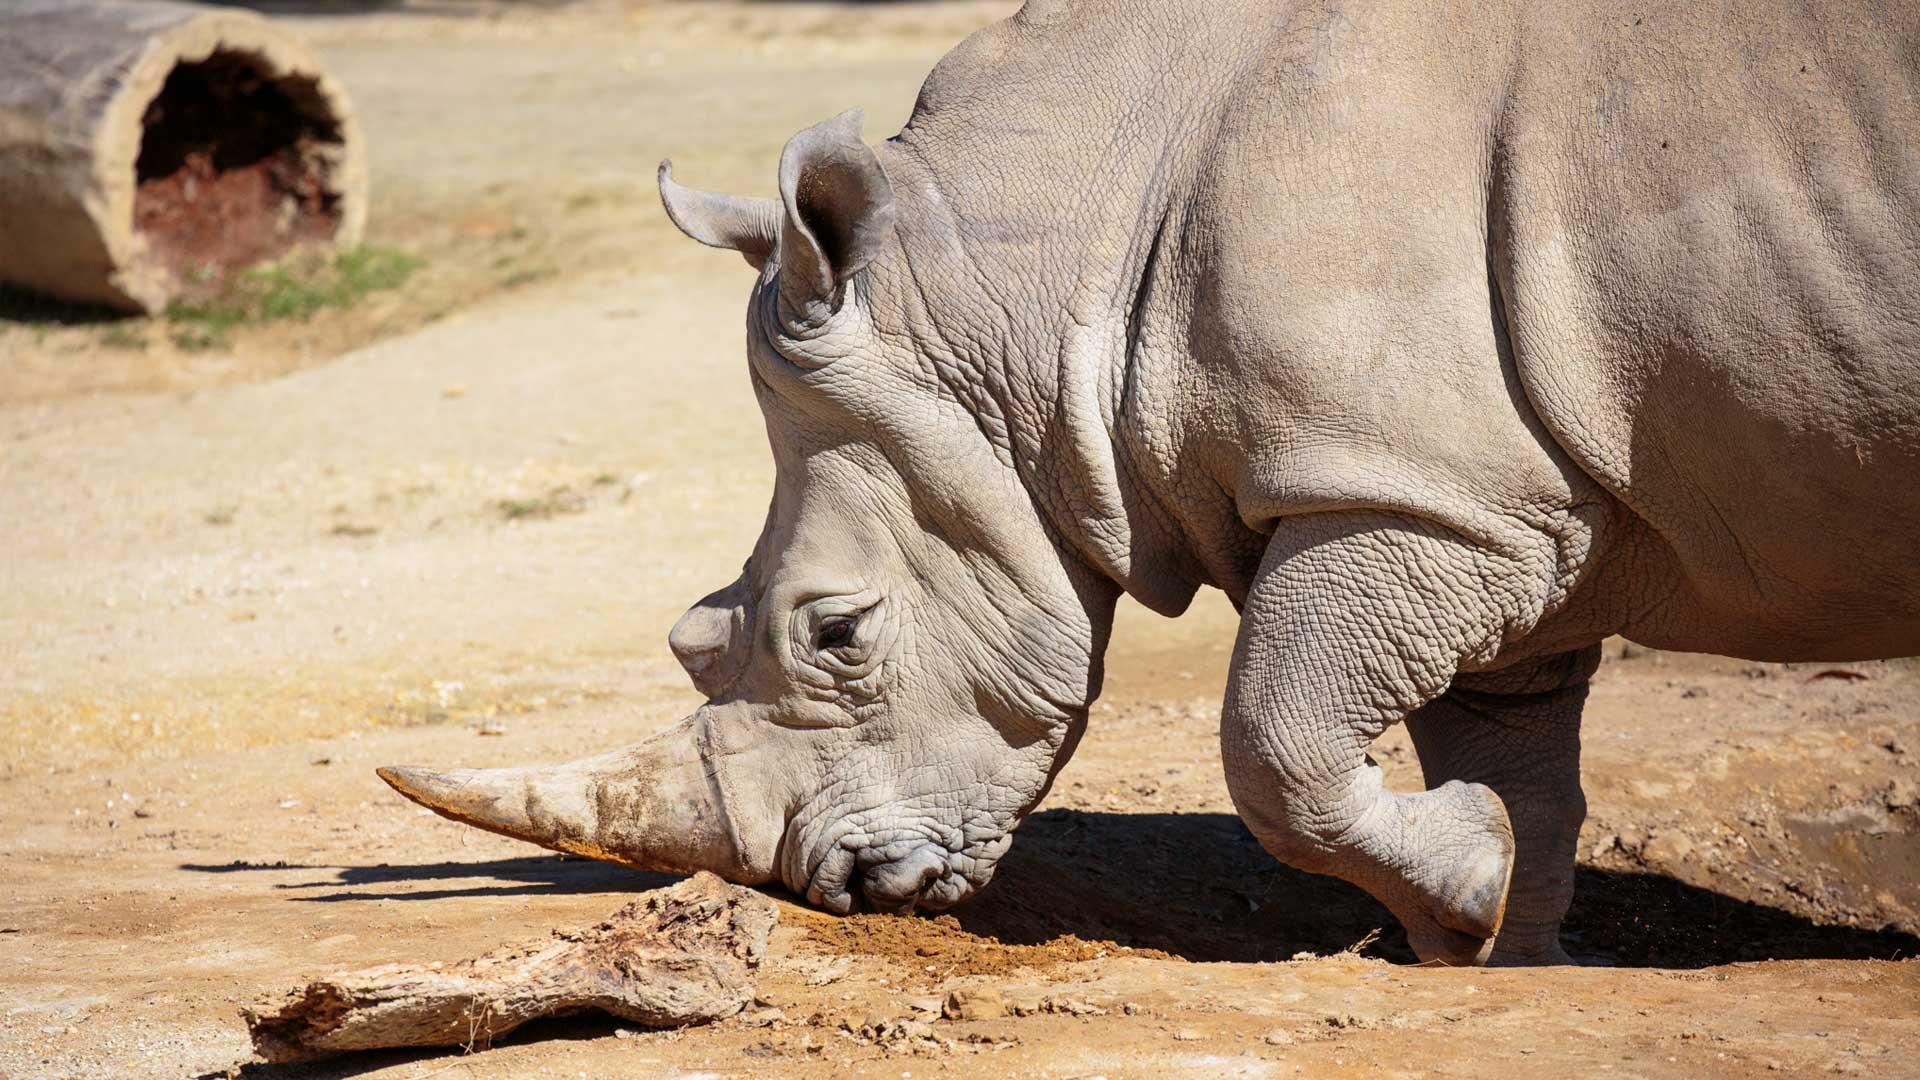 https://rfacdn.nz/zoo/assets/media/rhino-gallery-2.jpg